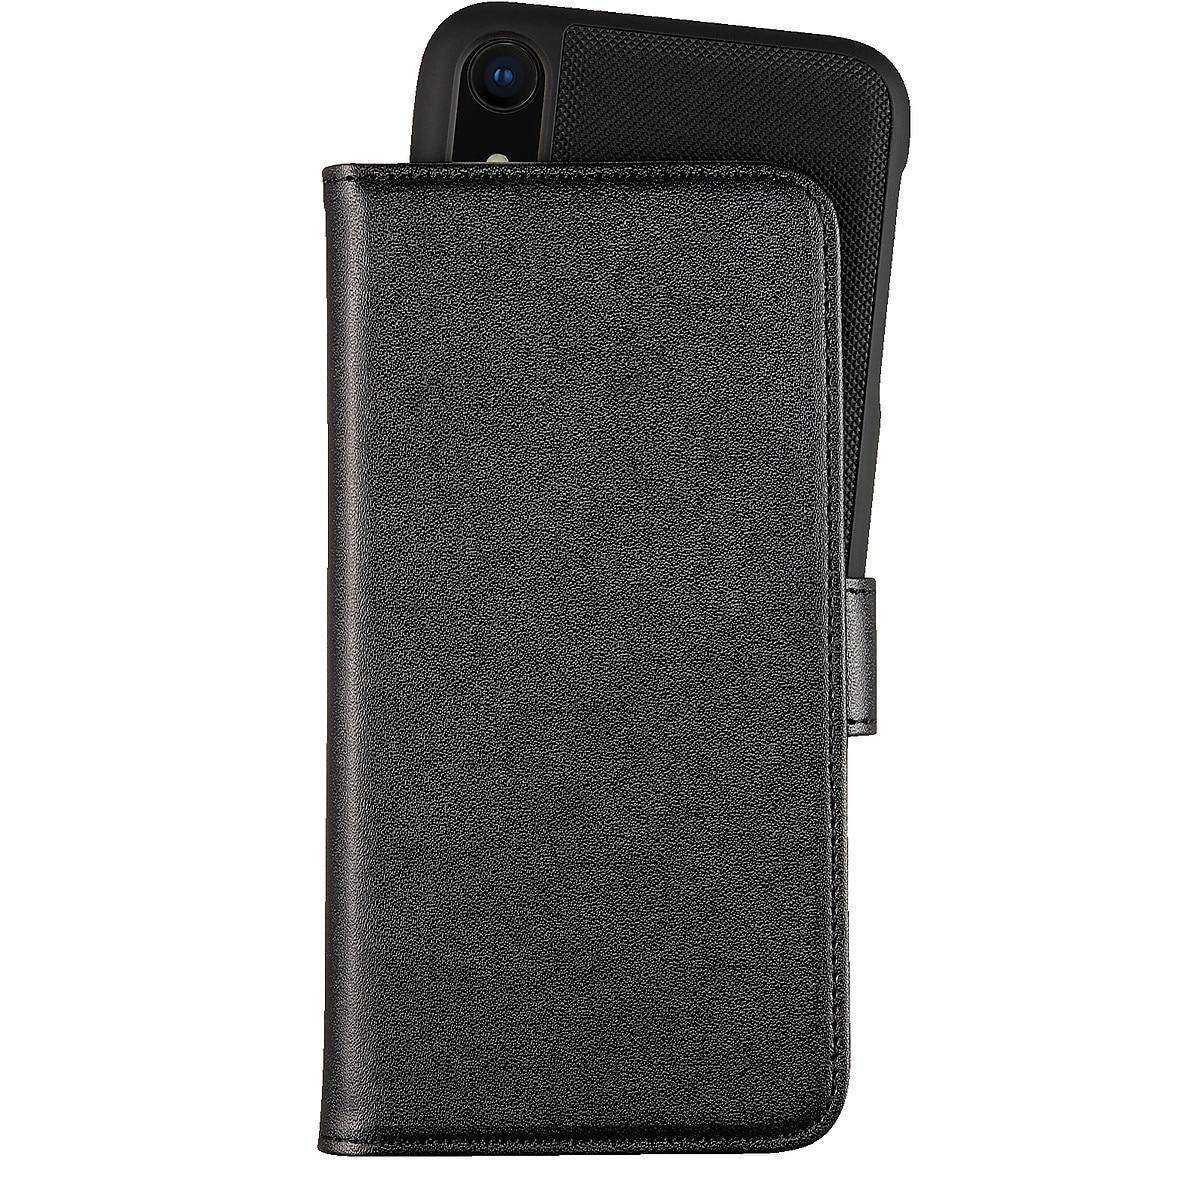 Plånboksfodral för iPhone XR Holdit